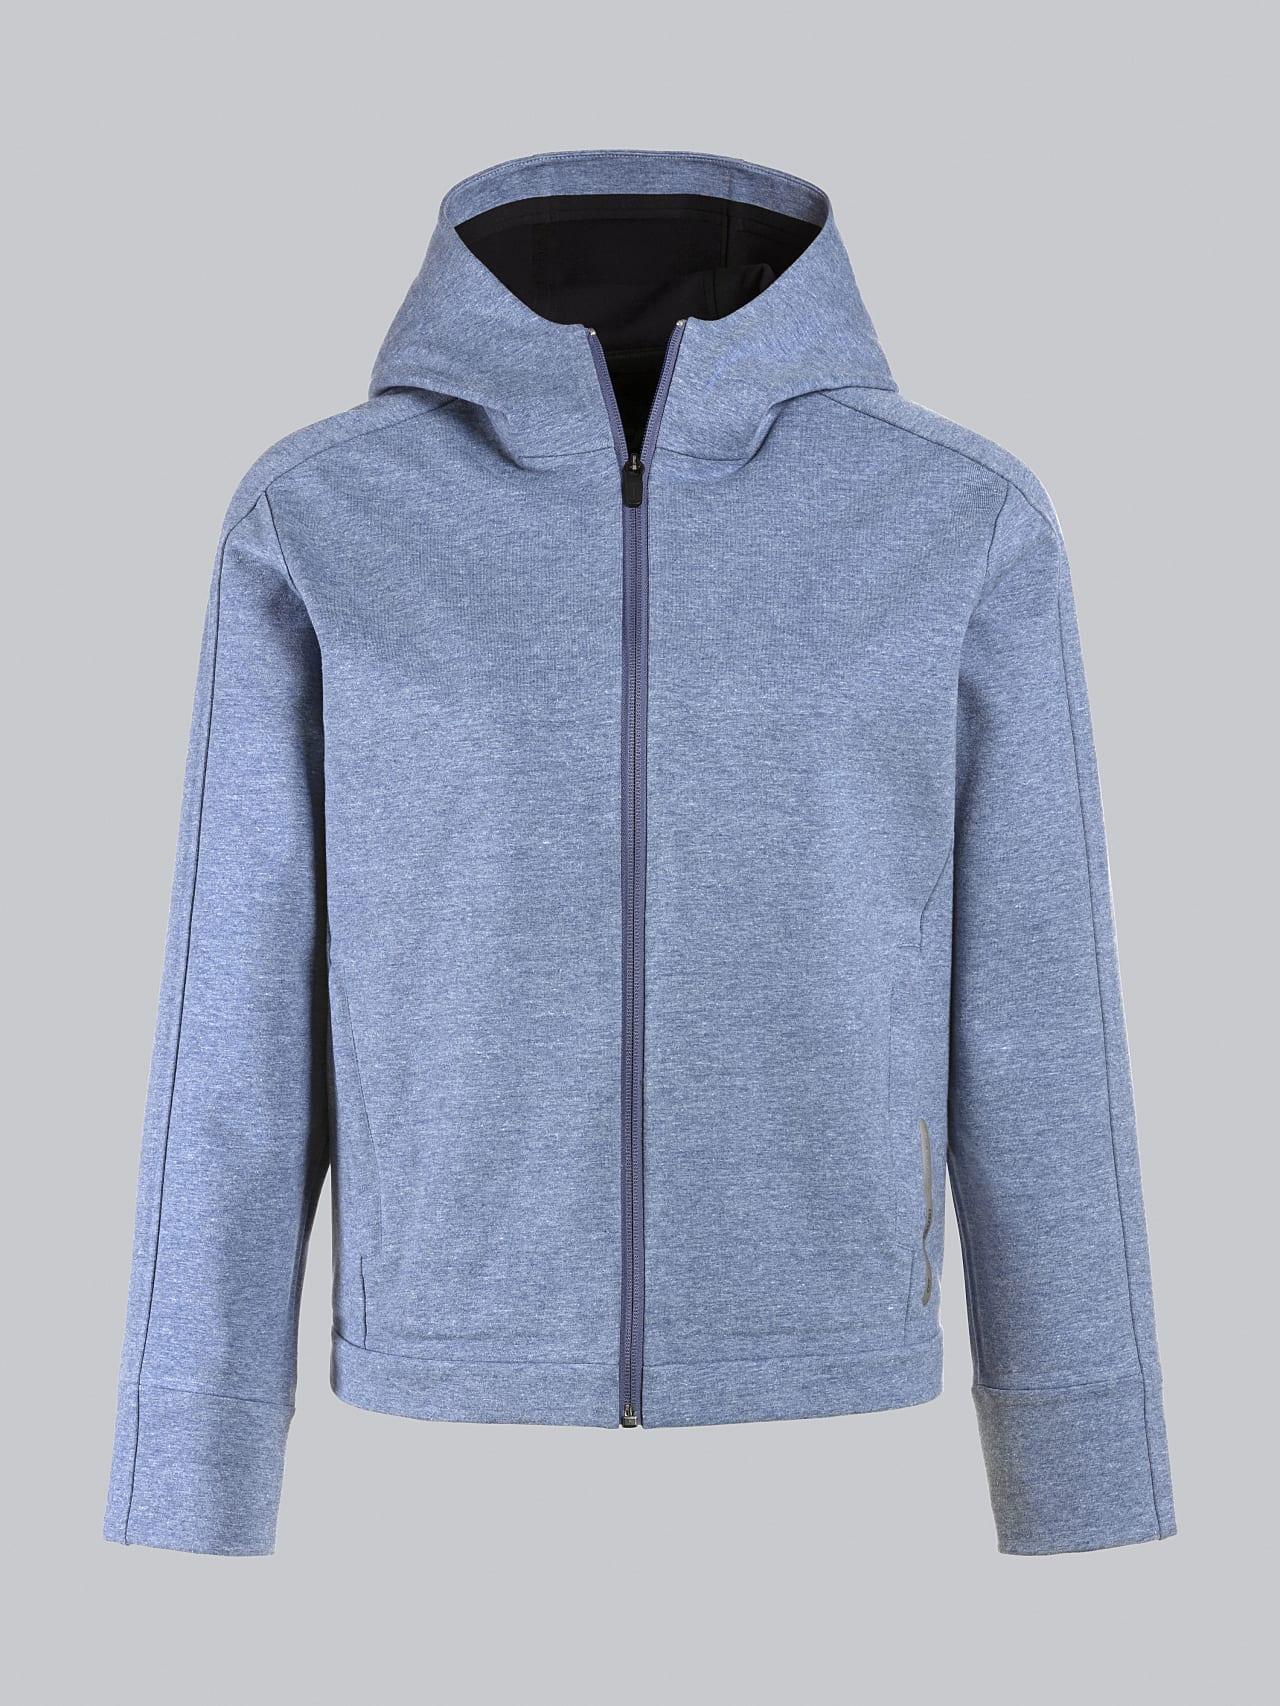 SINNO V2.Y5.02 Waterproof Hooded Jacket medium blue Back Alpha Tauri